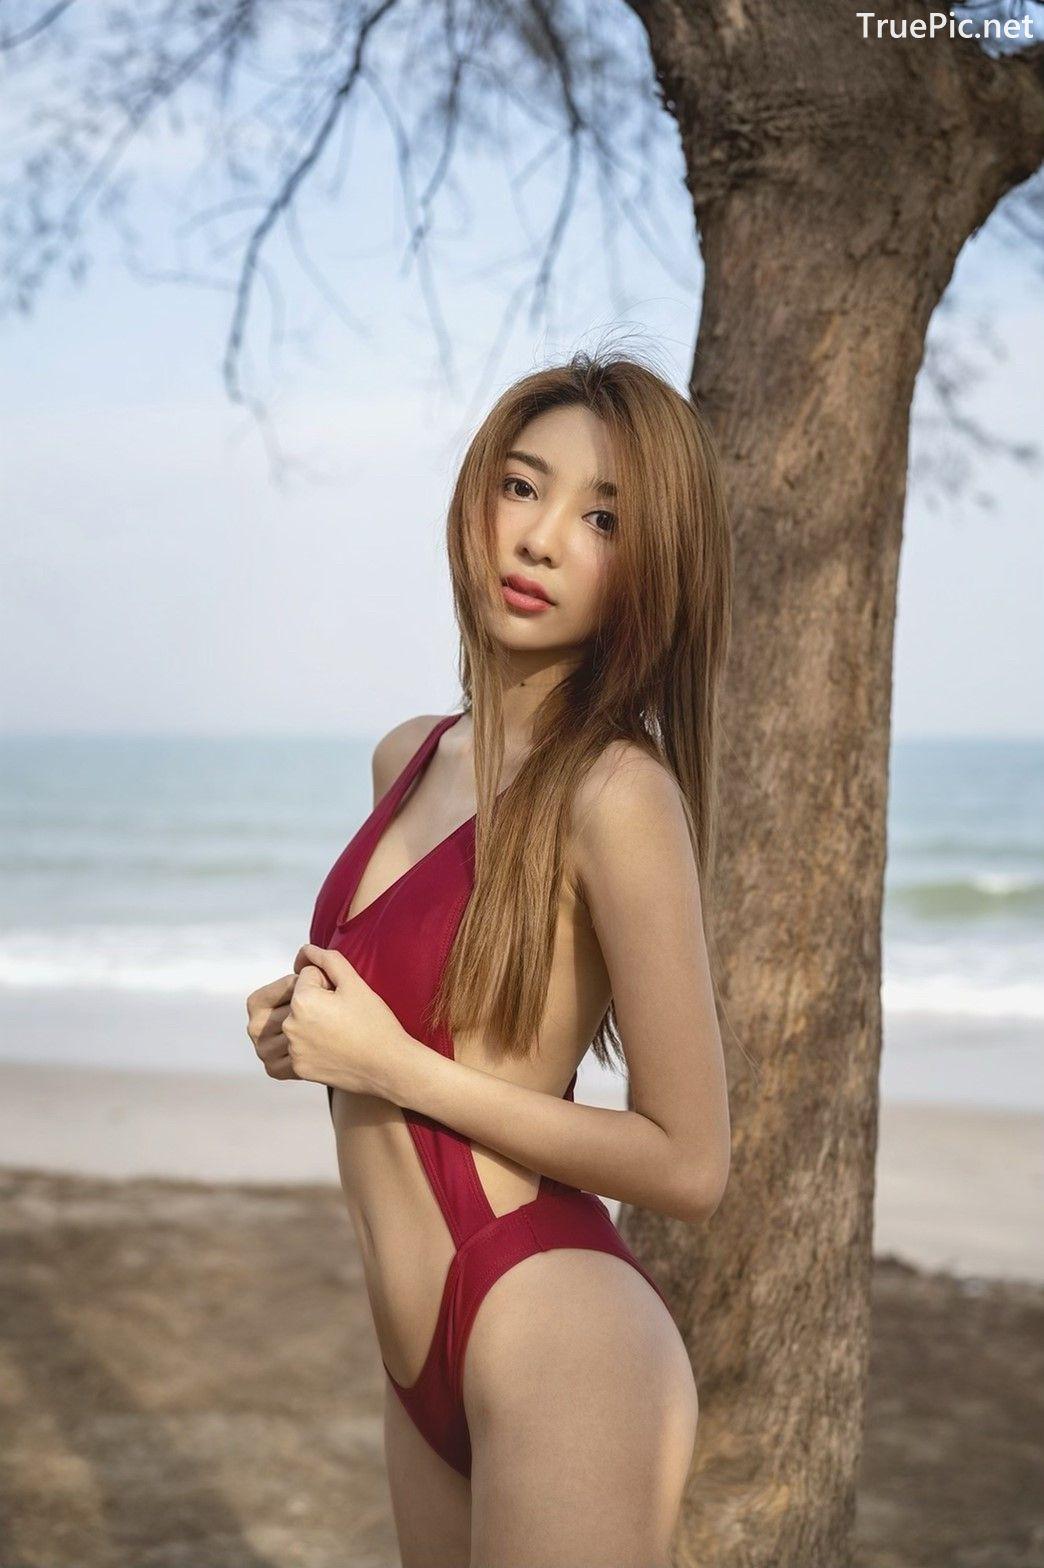 Image Thailand Model – Printlaaplus Zhaengchohm - Mixed Salad Bikini - TruePic.net - Picture-1